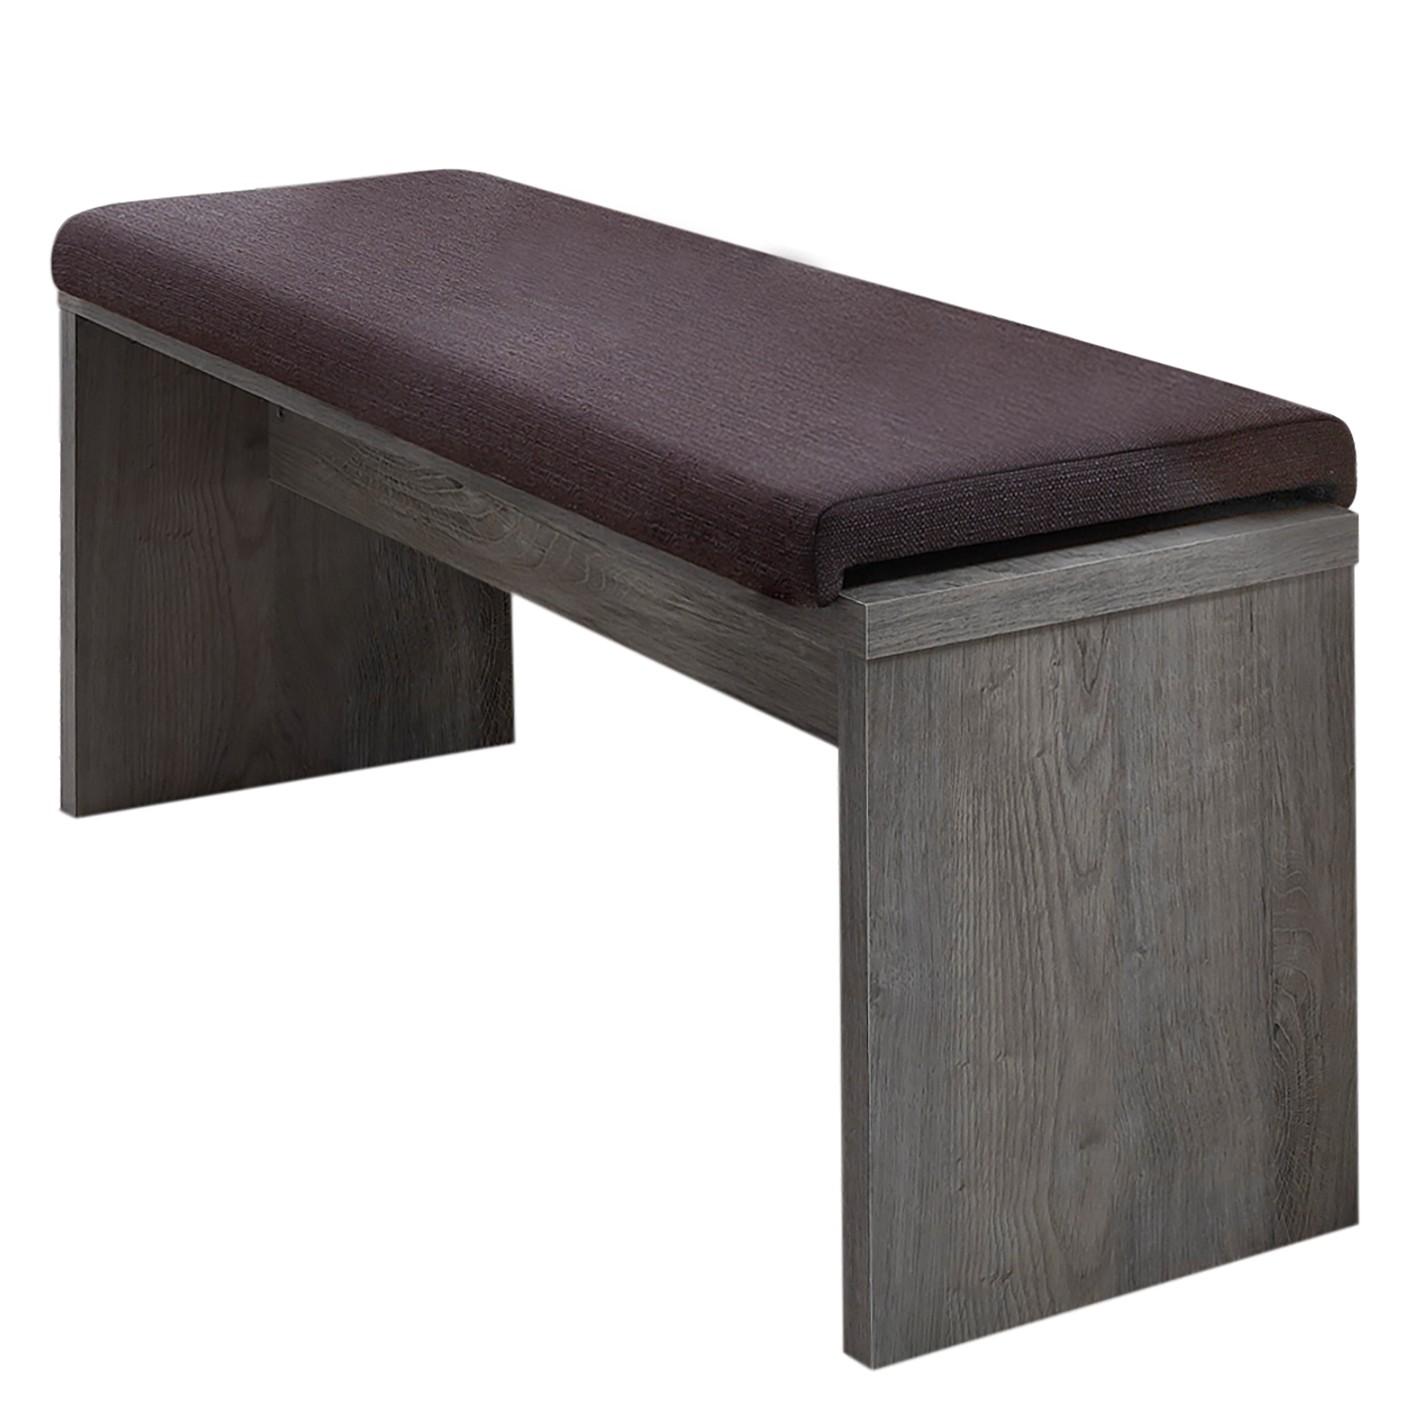 home24 Sitzbank Lehto (Inkl. Klemmkissen) | Küche und Esszimmer > Sitzbänke | Grau | Holzwerkstoff - Textil | loftscape